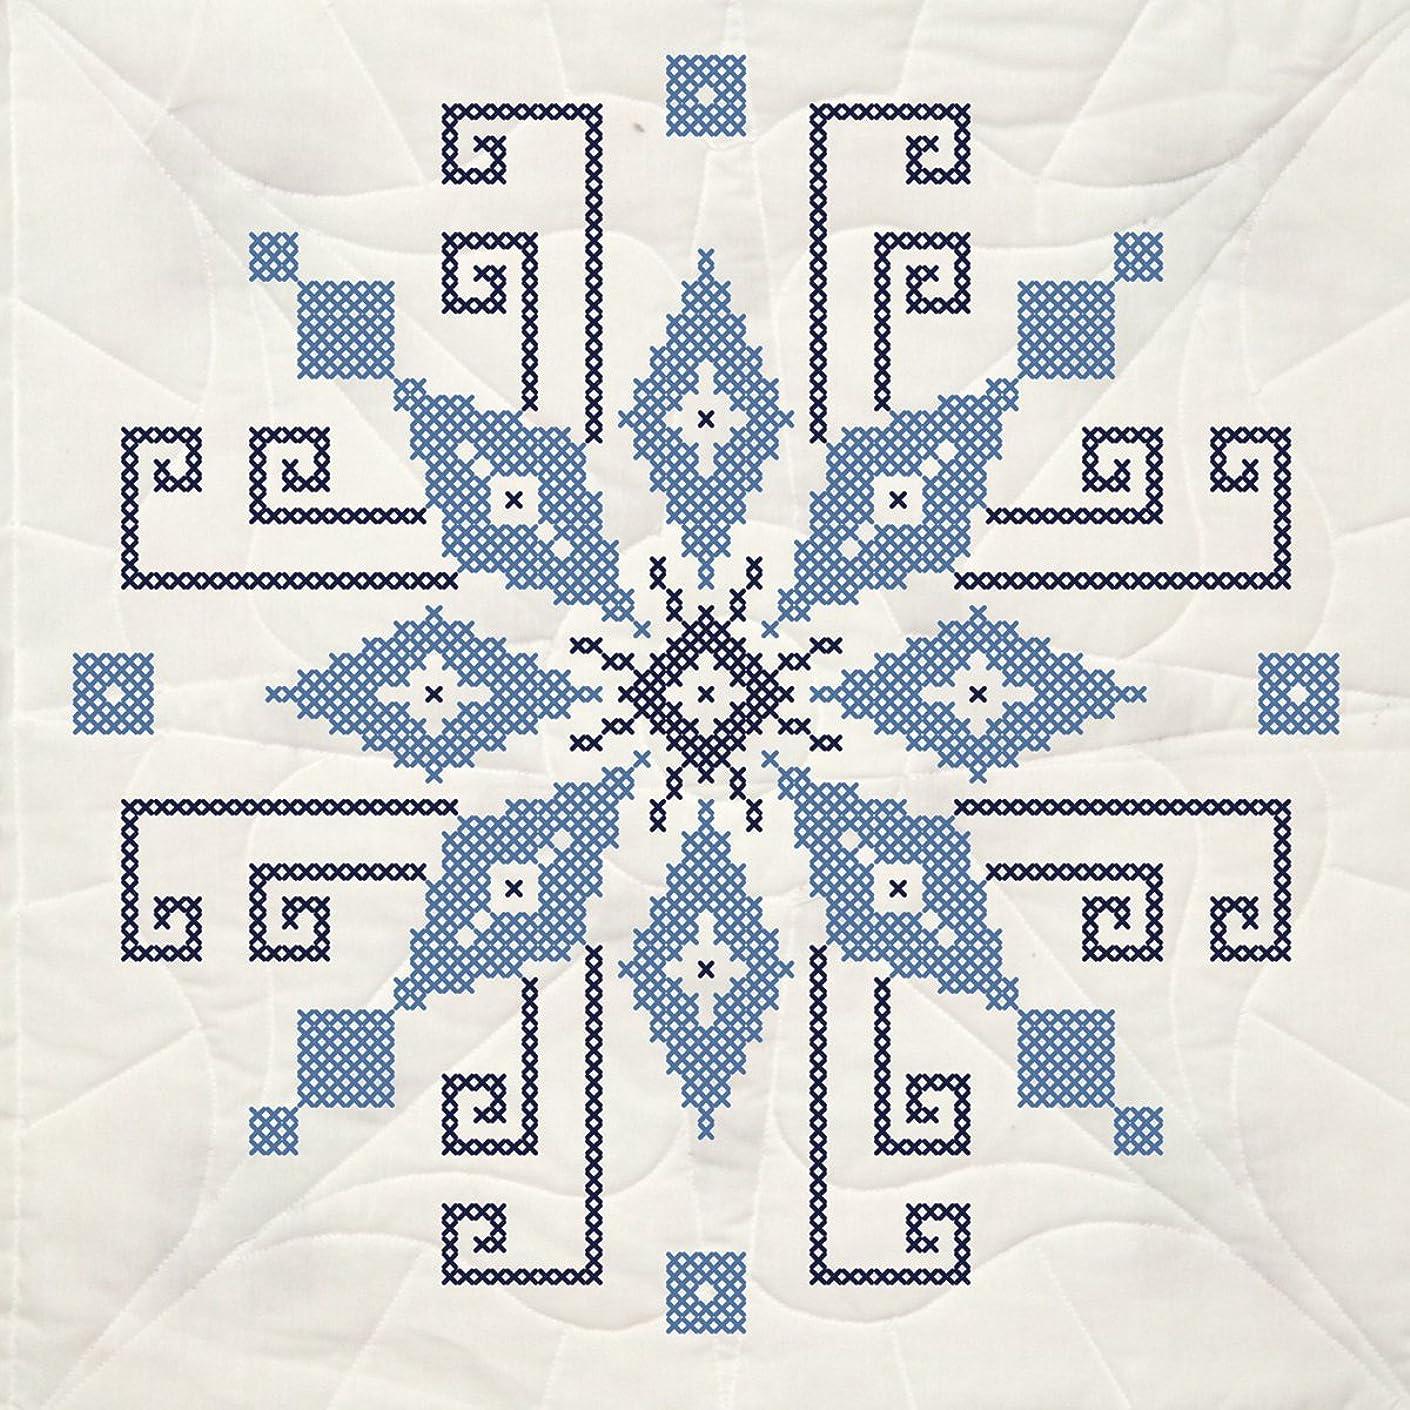 Fairway 95211 Quilt Blocks, Pin Wheel Design, White, 6 Blocks Per Set